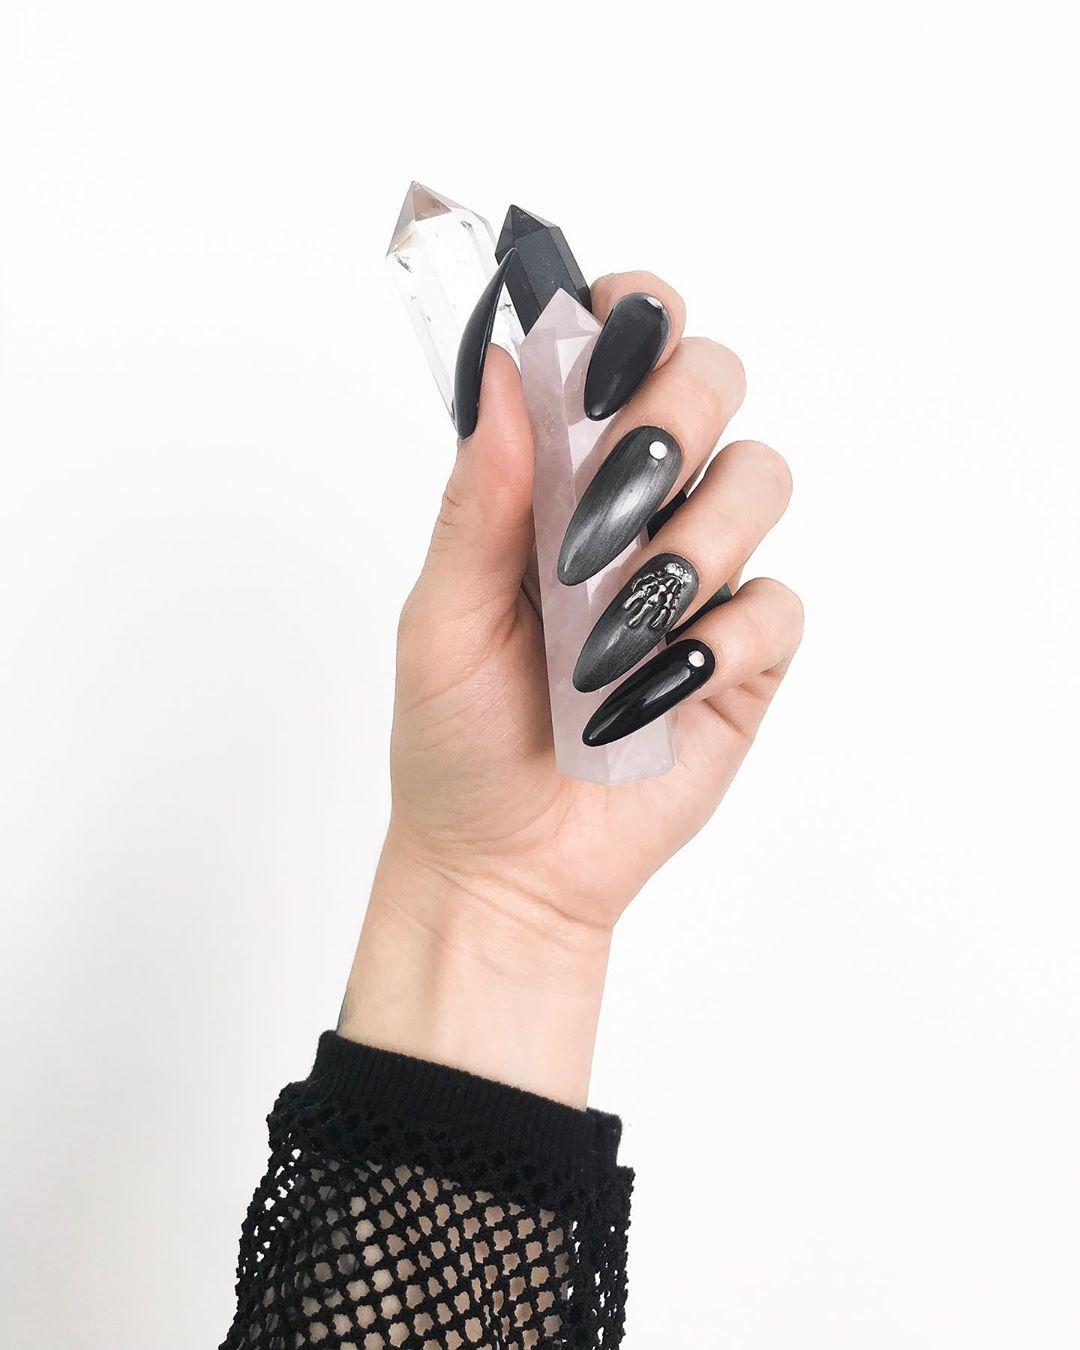 stiletto nails ideas | goth matte black stiletto nails | halloween stiletto nails